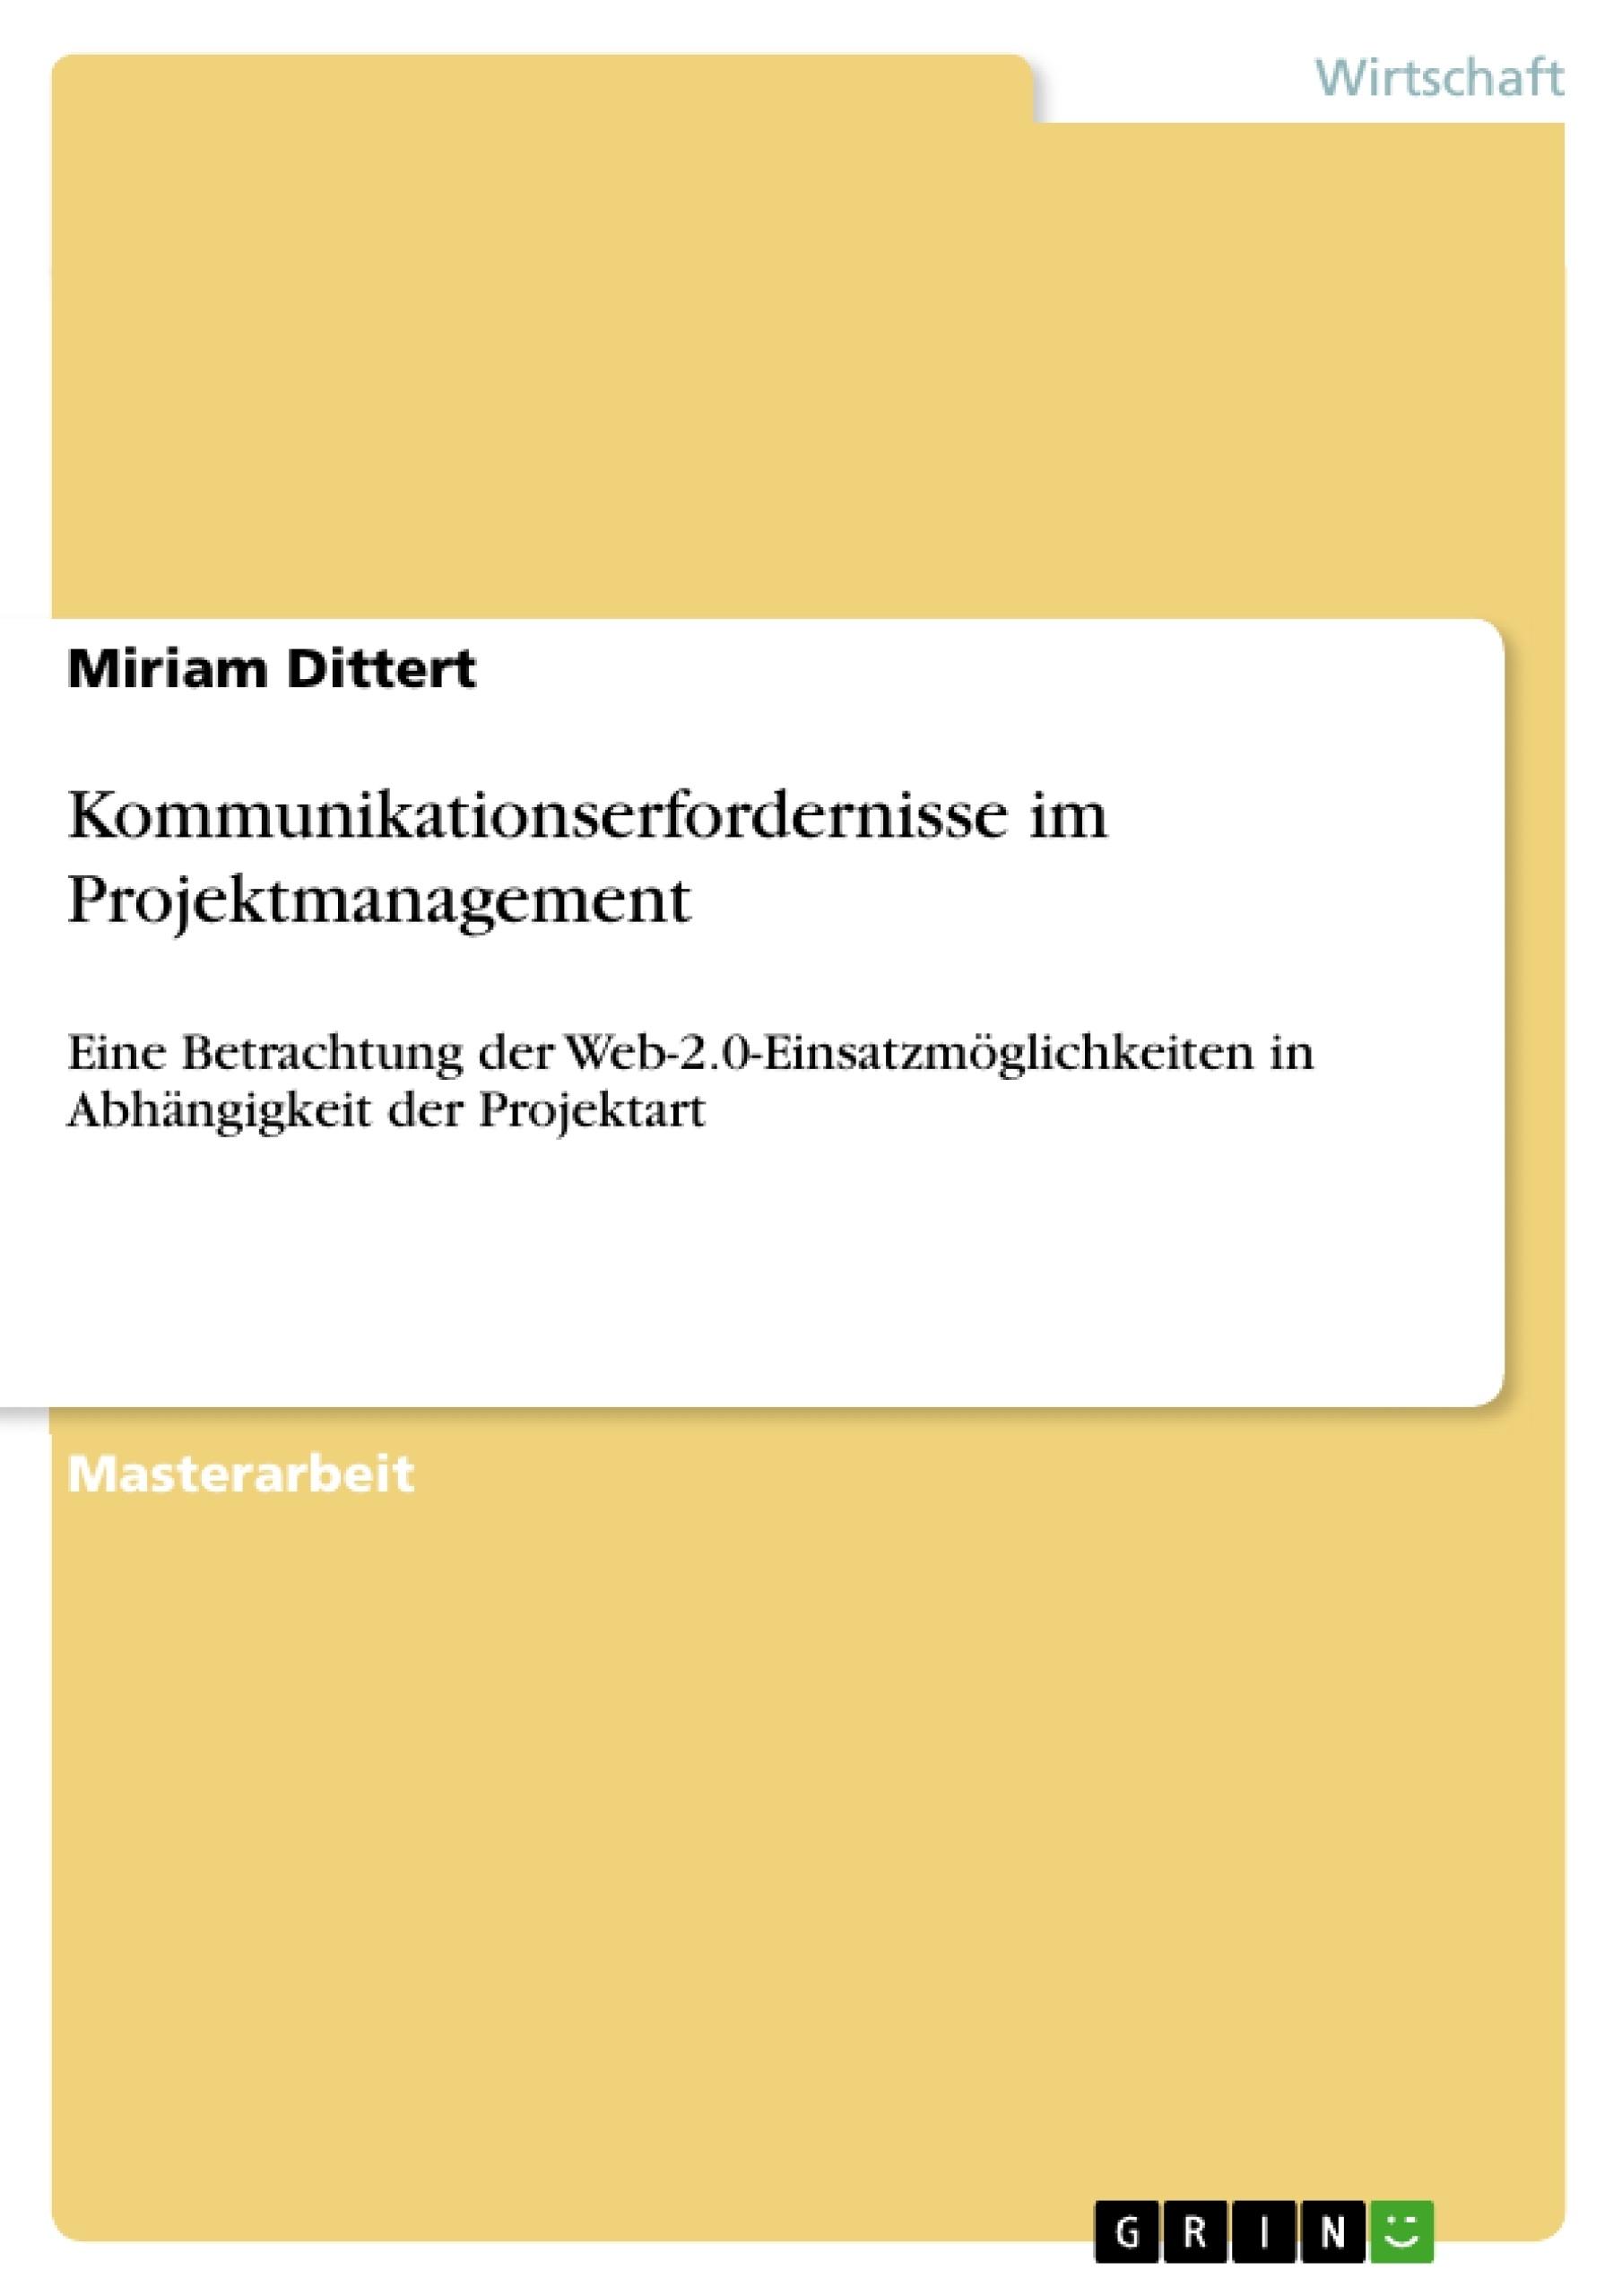 Titel: Kommunikationserfordernisse im Projektmanagement